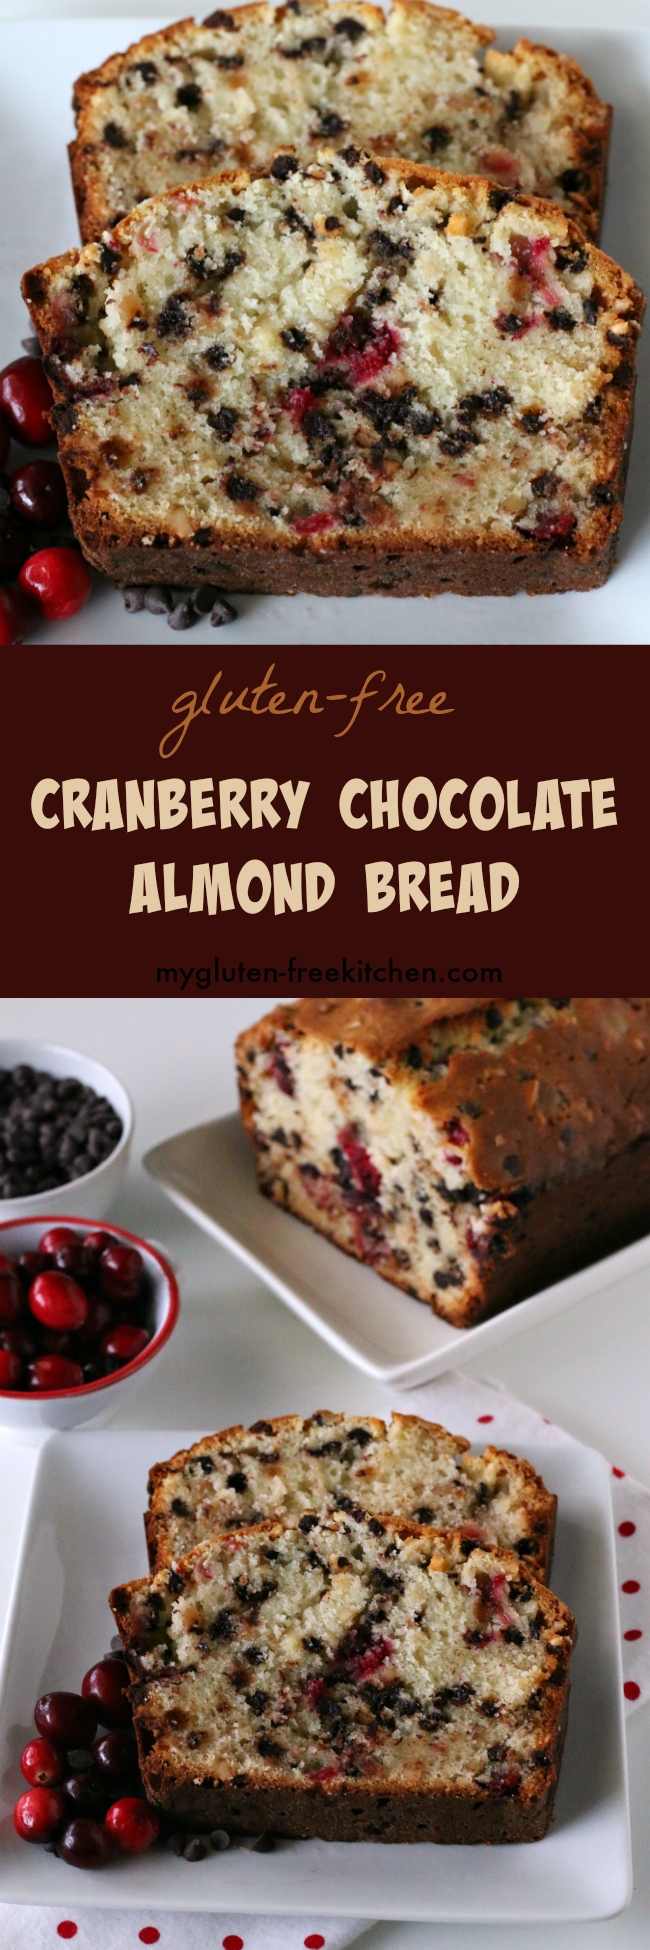 Gluten-free Cranberry Chocolate Almond Bread recipe